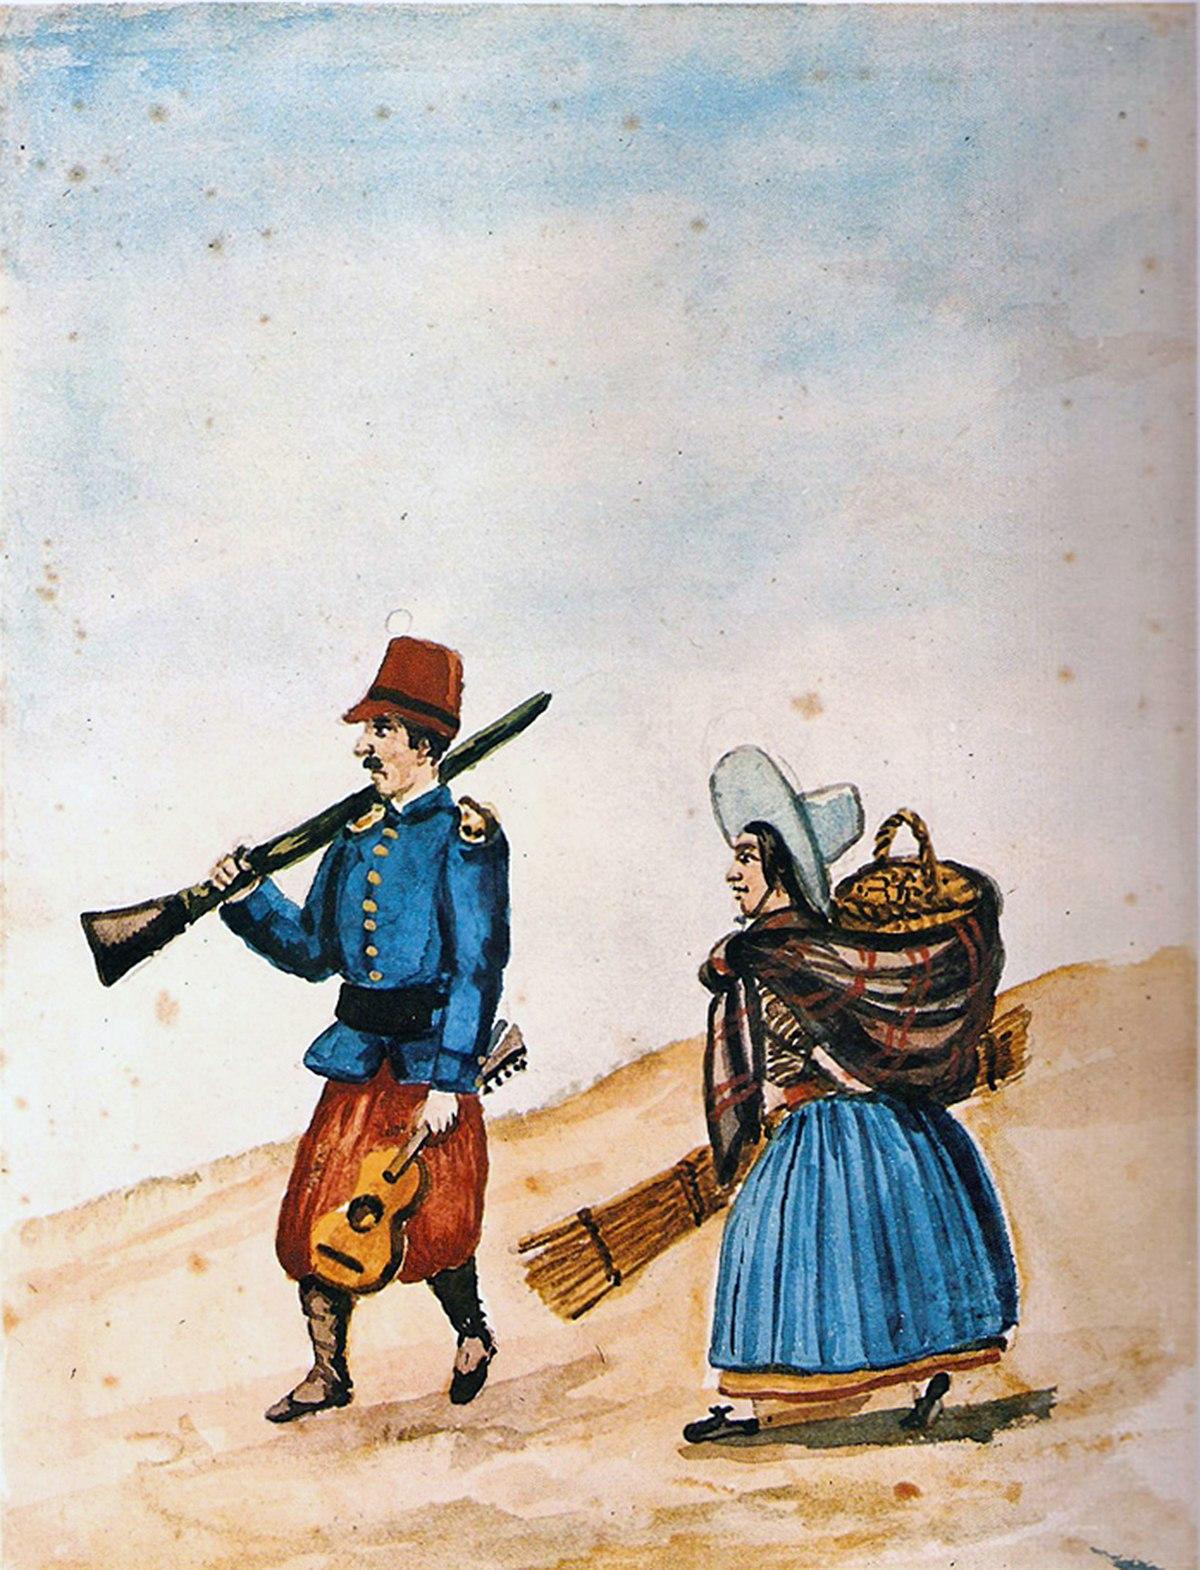 Rabona (personaje) - Wikipedia, la enciclopedia libre